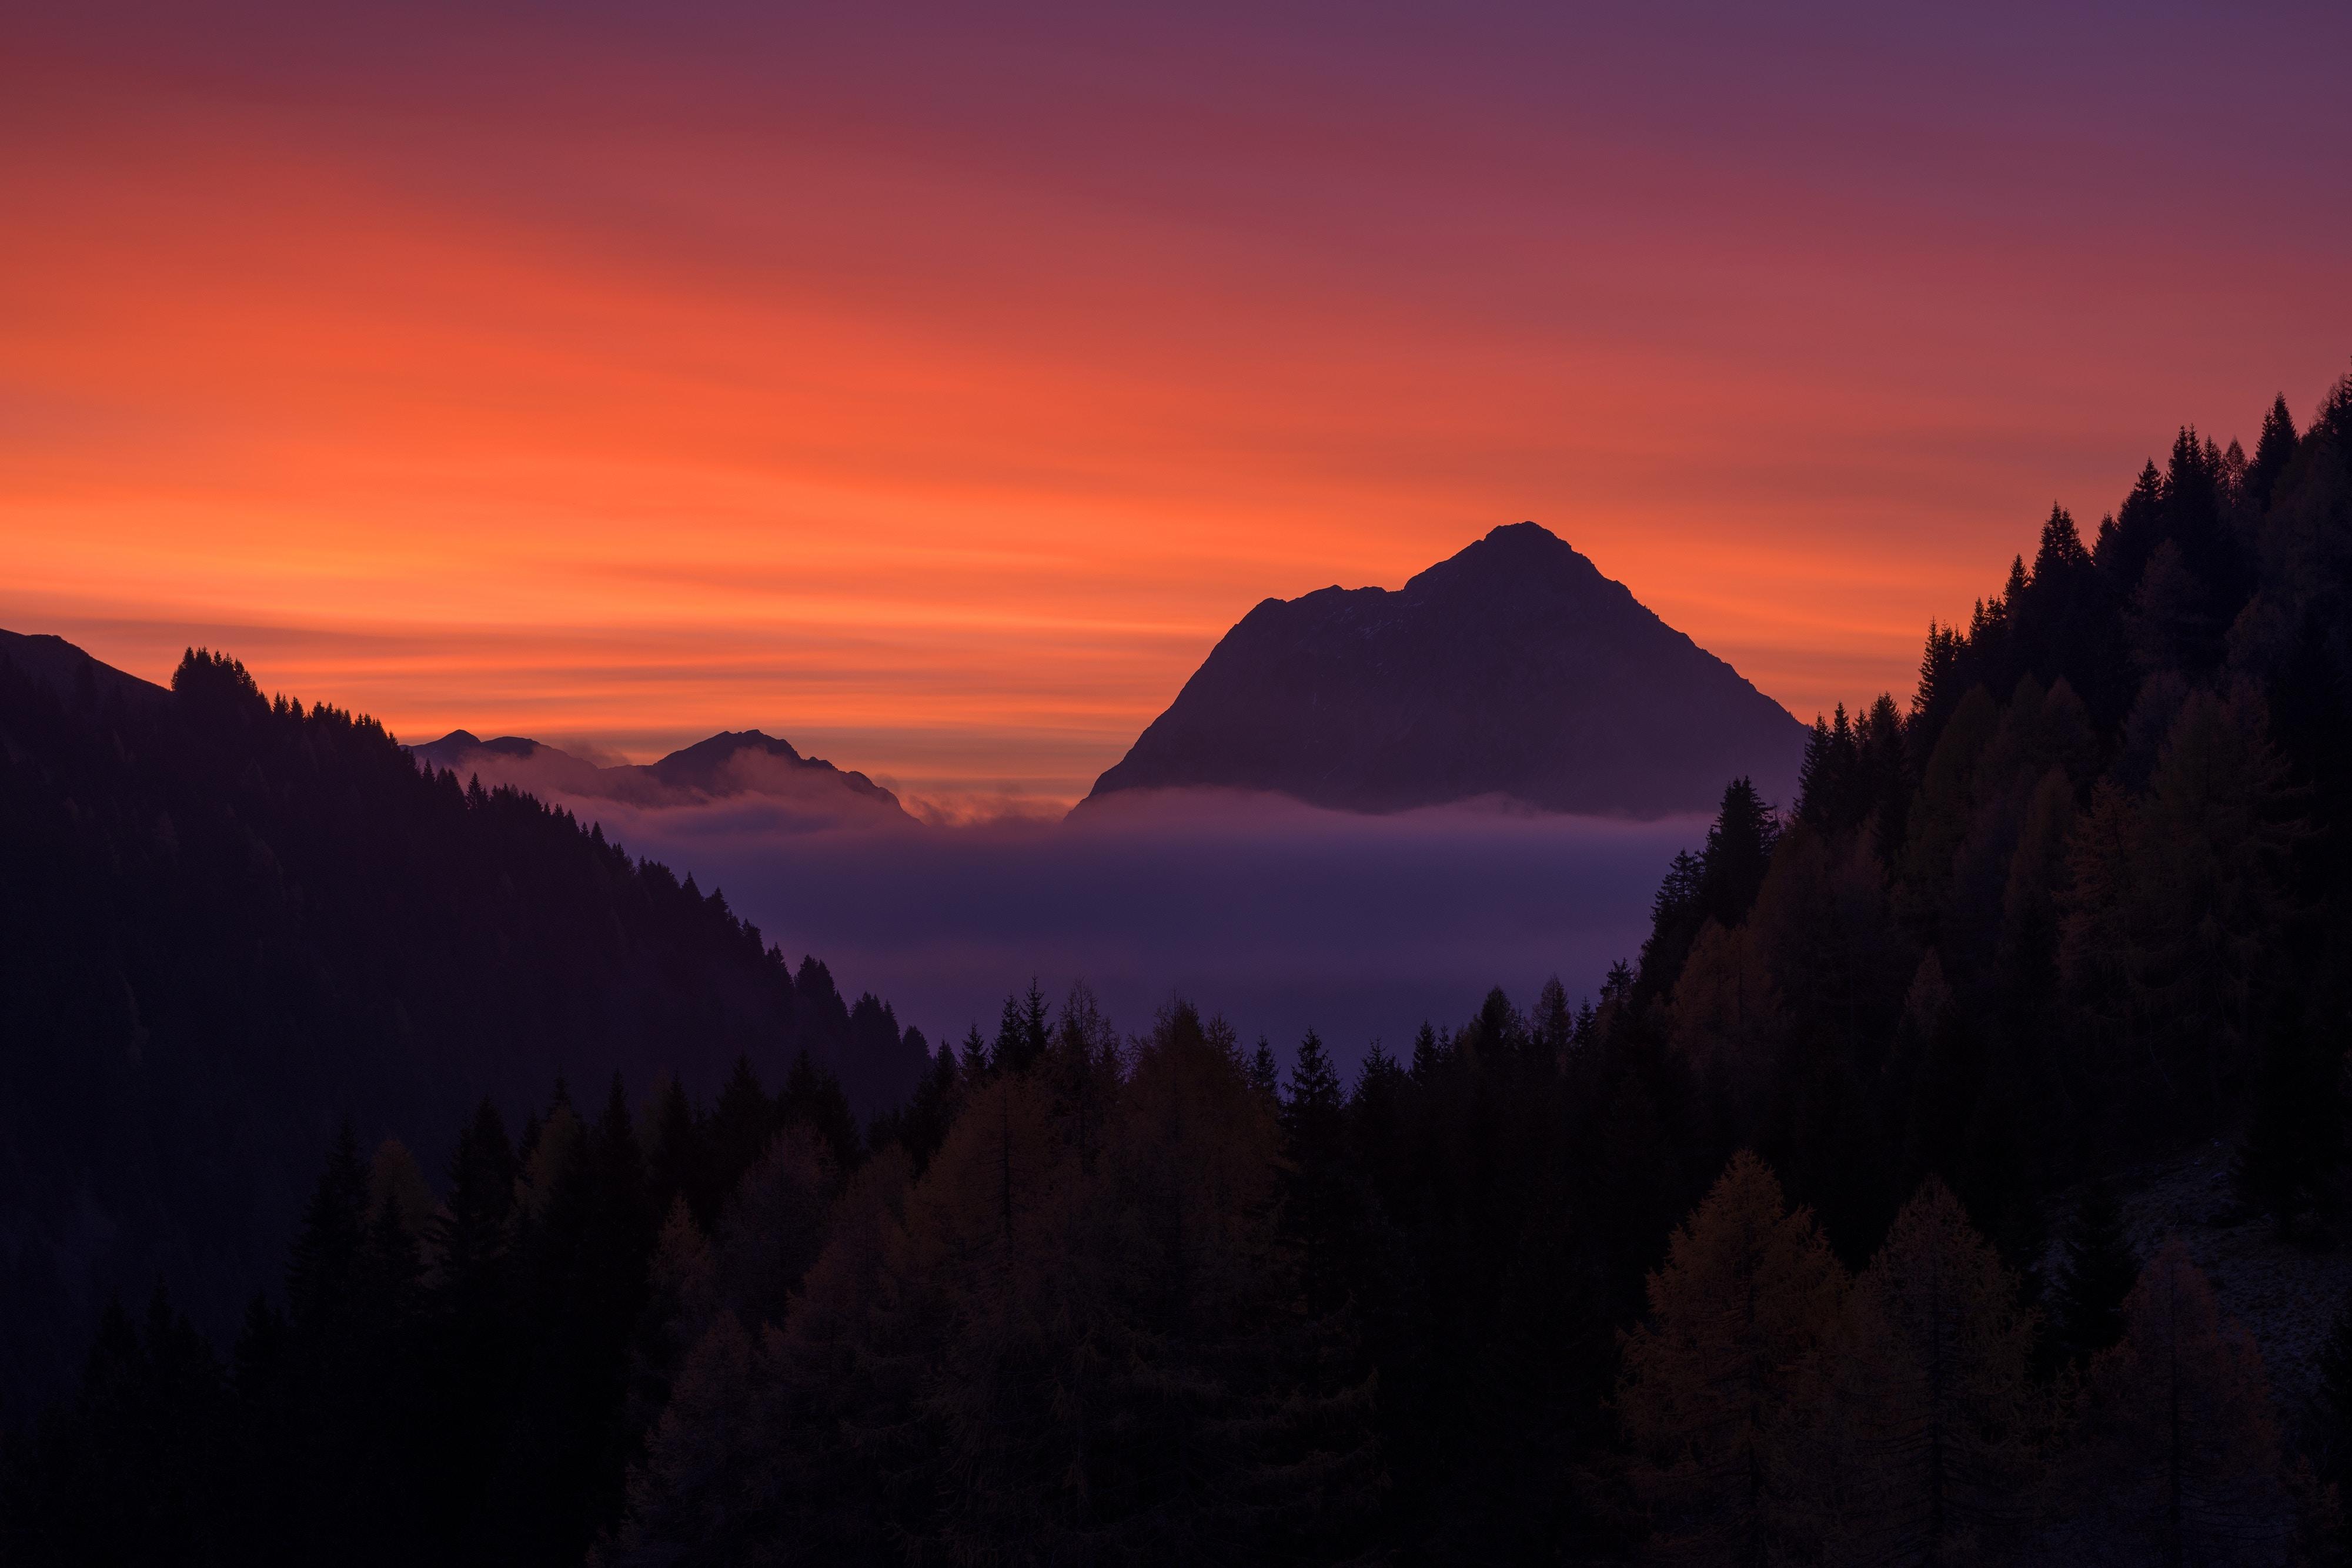 5391777 4000x2667 #woodland, #tree, #nature, #sunrise, #sunset, #sky, # mountain layers, #mountain ridge, #orange, #mountain line, #mountain, # sunset sky, #morning, #night, #mountain peak, #cloud, #dark, #Free pictures, #seacloud, #forest, #orange sky ...